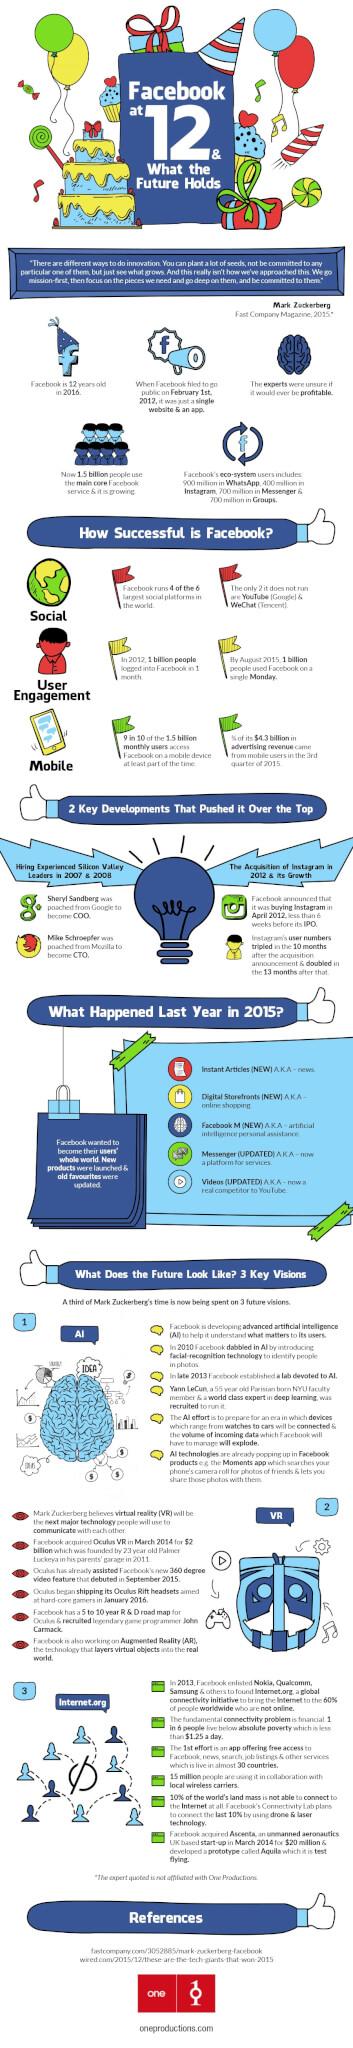 Facebook infographic the future of Facebook